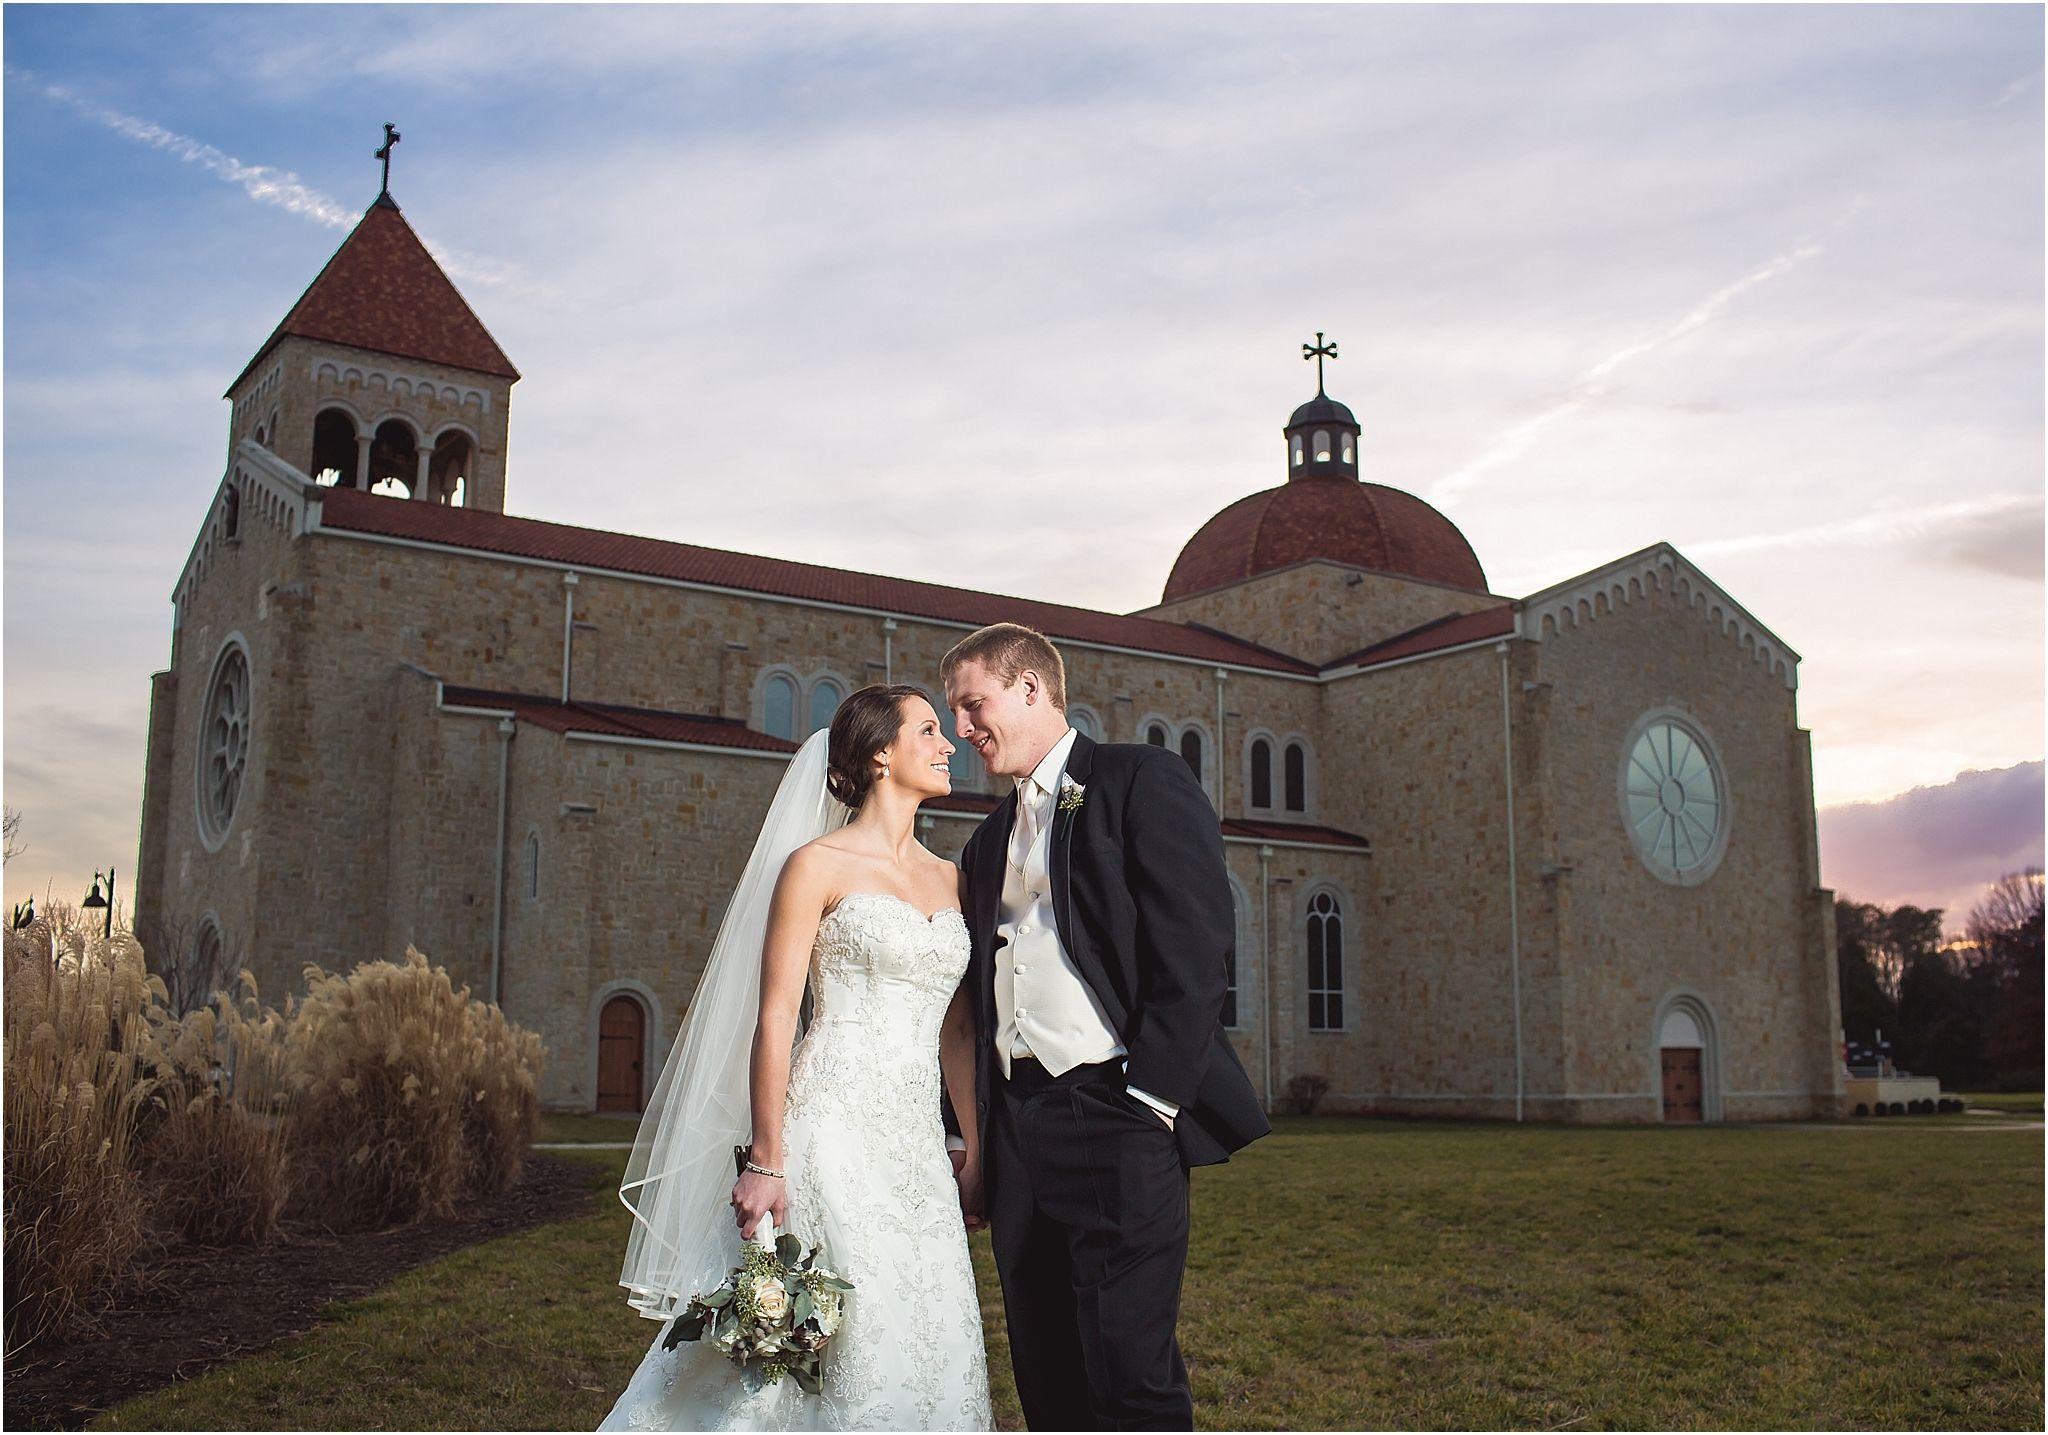 st john neumann, knoxville wedding photographer, photographers in Knoxville, Wedding photographer Knoxville TN